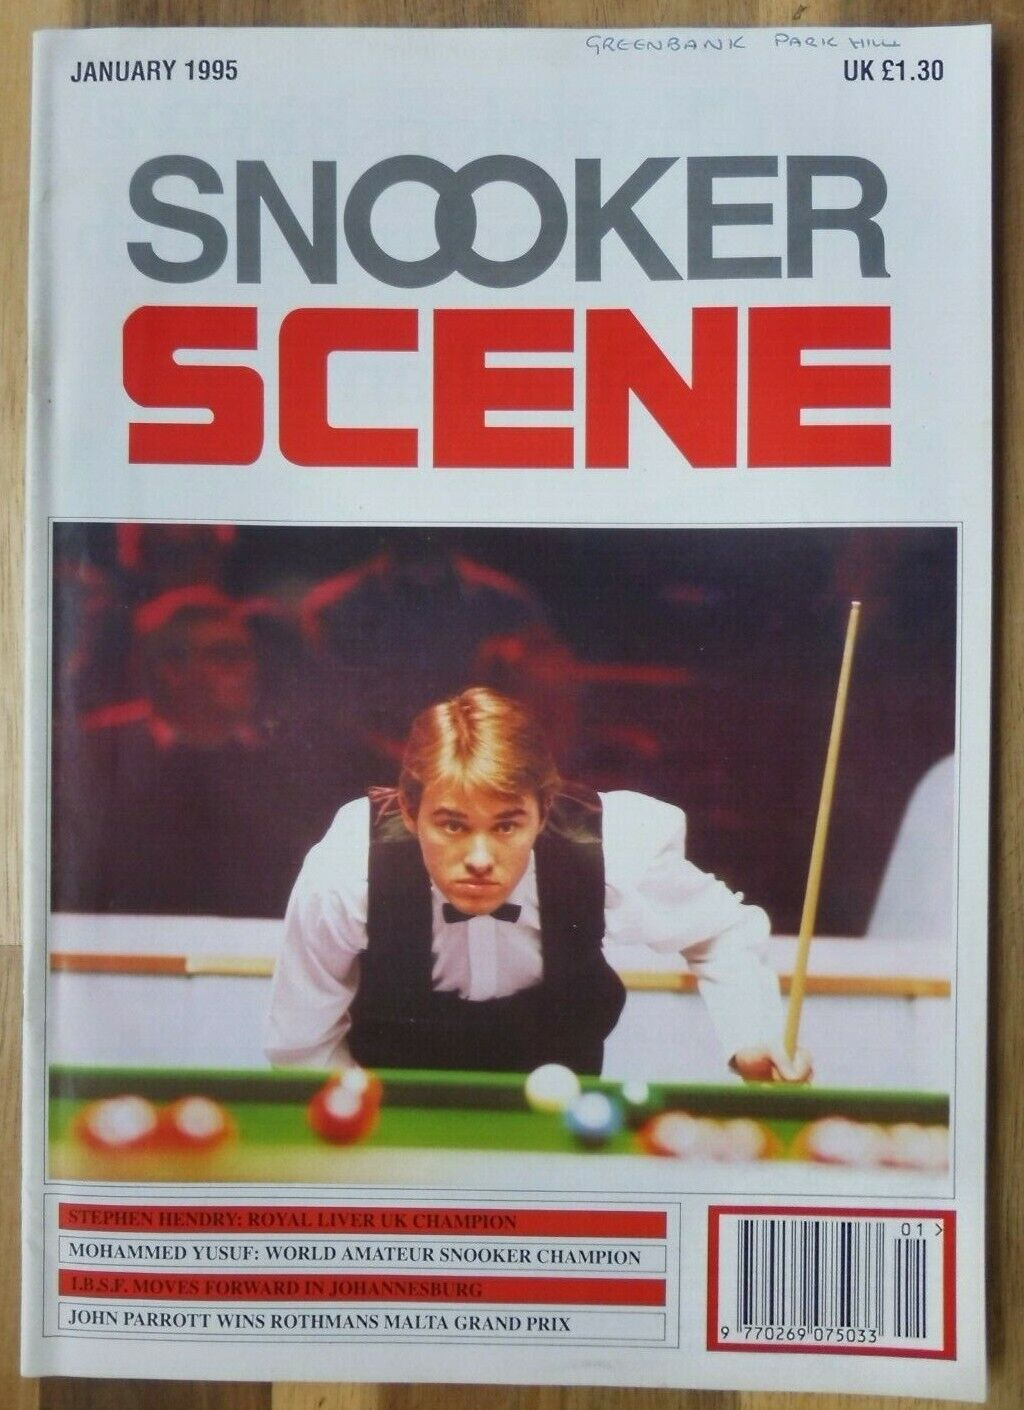 Snooker Scene Magazine, January 1995, Good Condition.